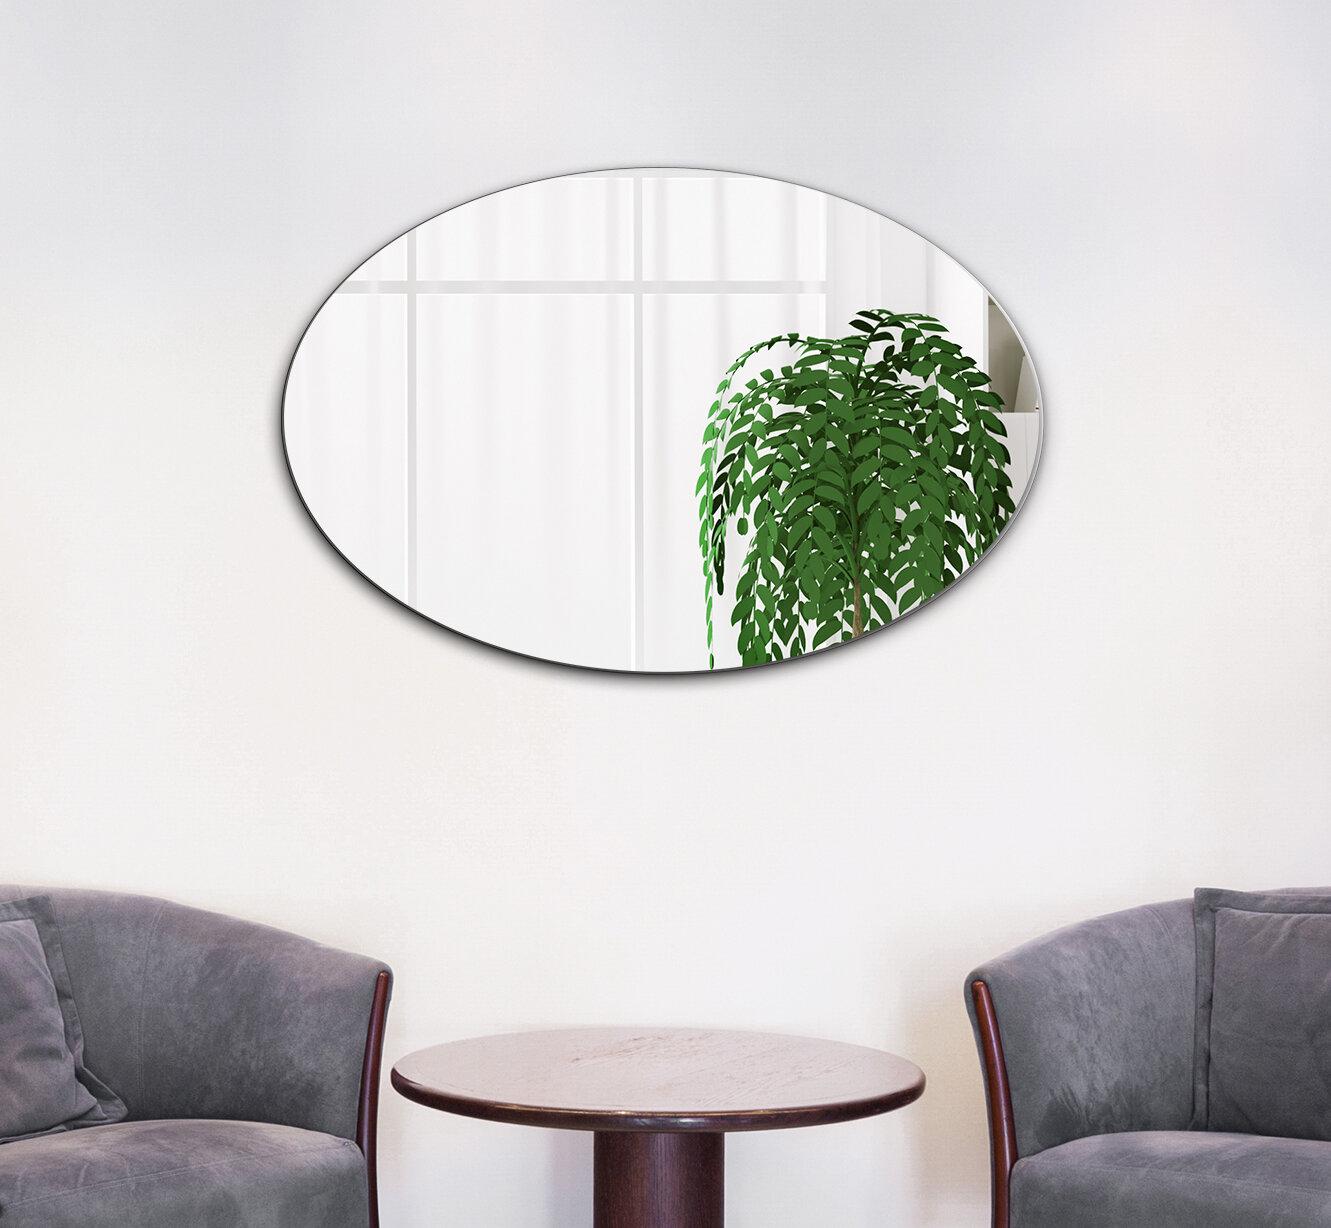 Charlton Home Kaylie Frameless Beveled Oval Bathroom/Vanity Mirror ...